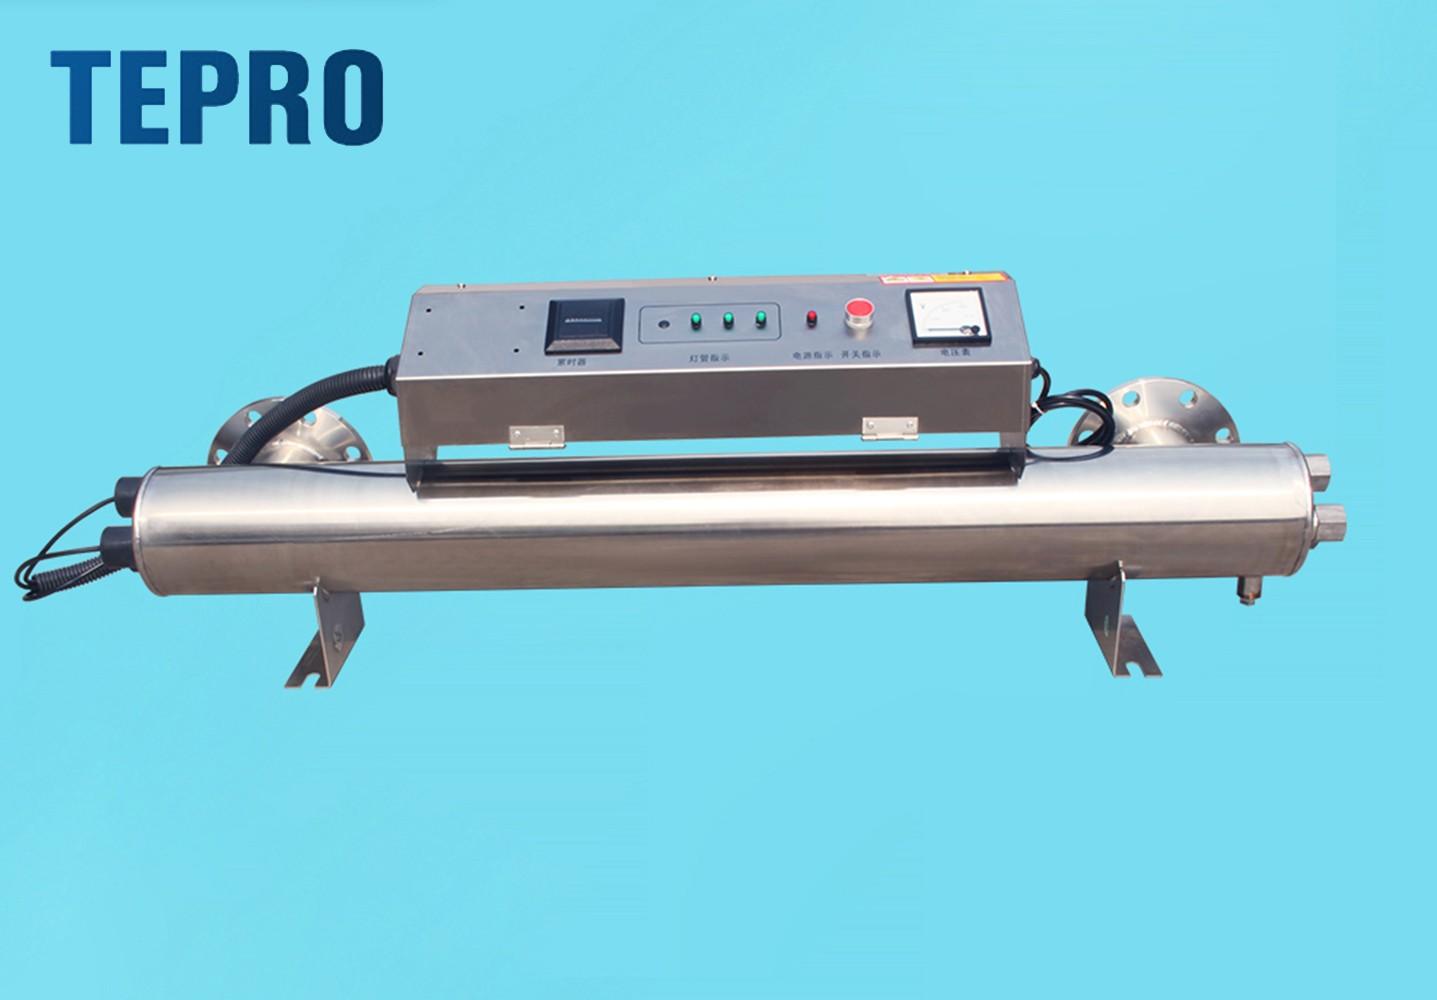 Tepro-Bactericidal Lamps, Uv C Light Sanitizer Price List | Tepro